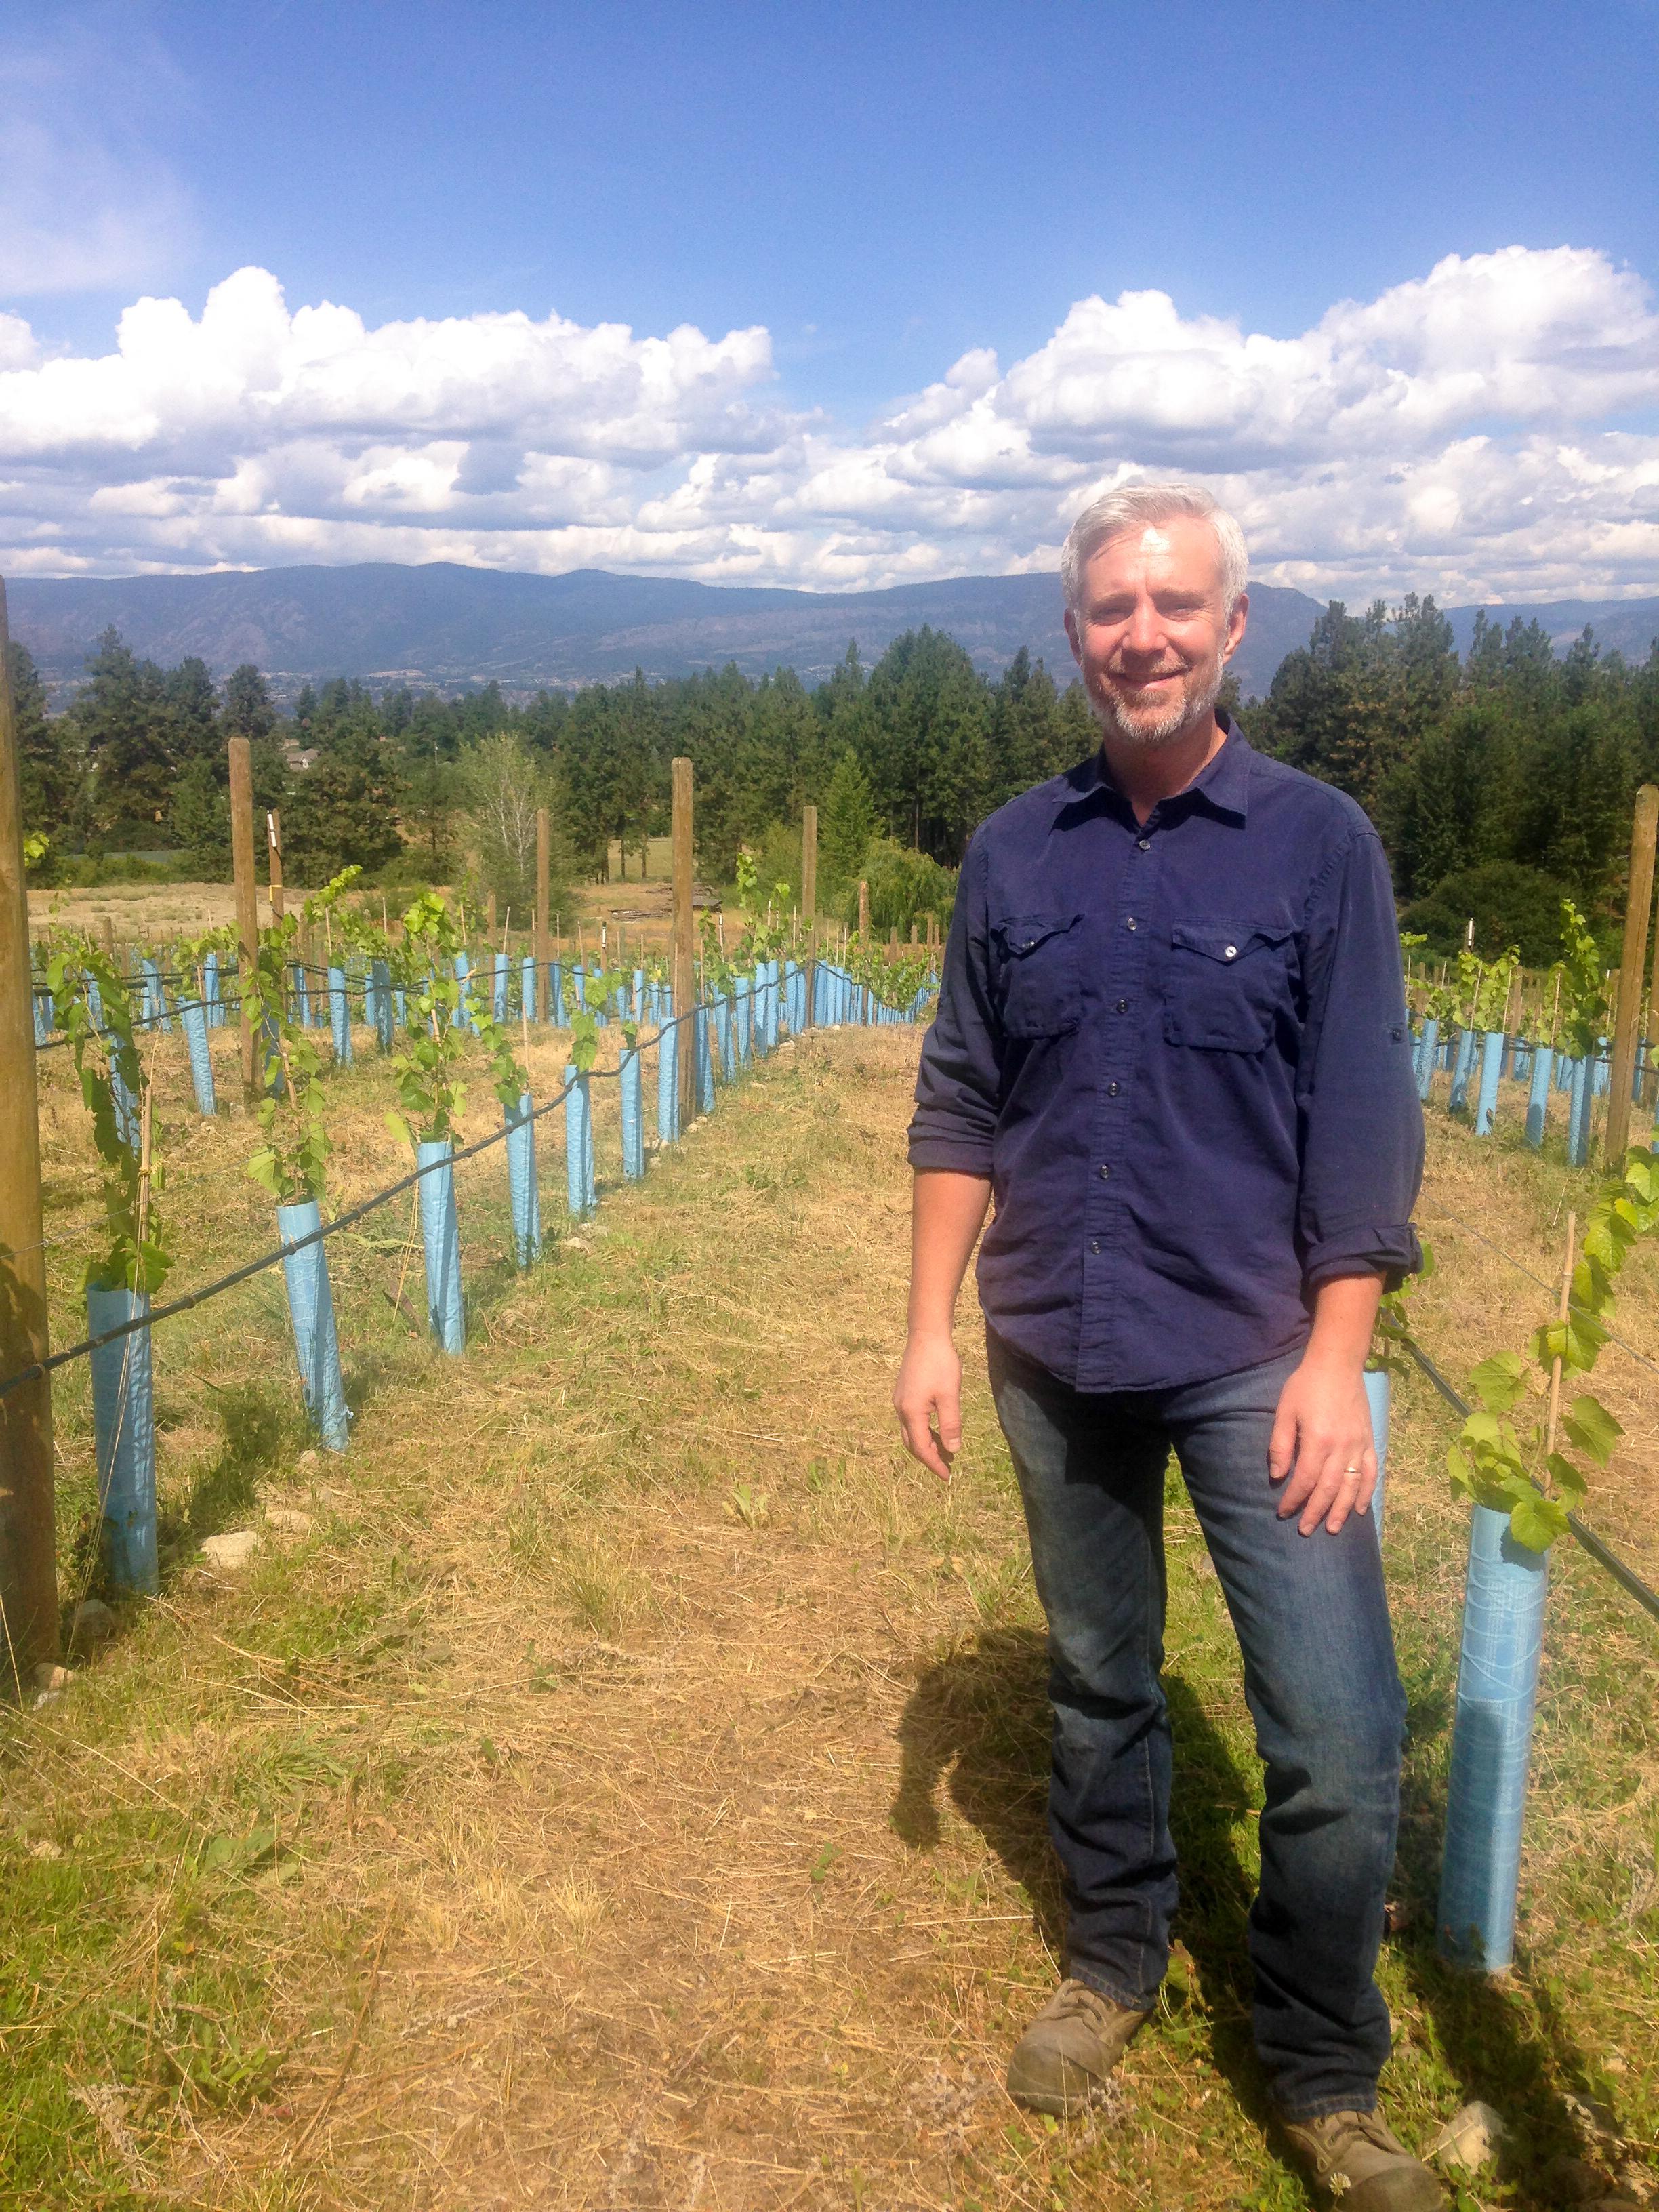 Rob Westbury, Nagging Doubt Winery